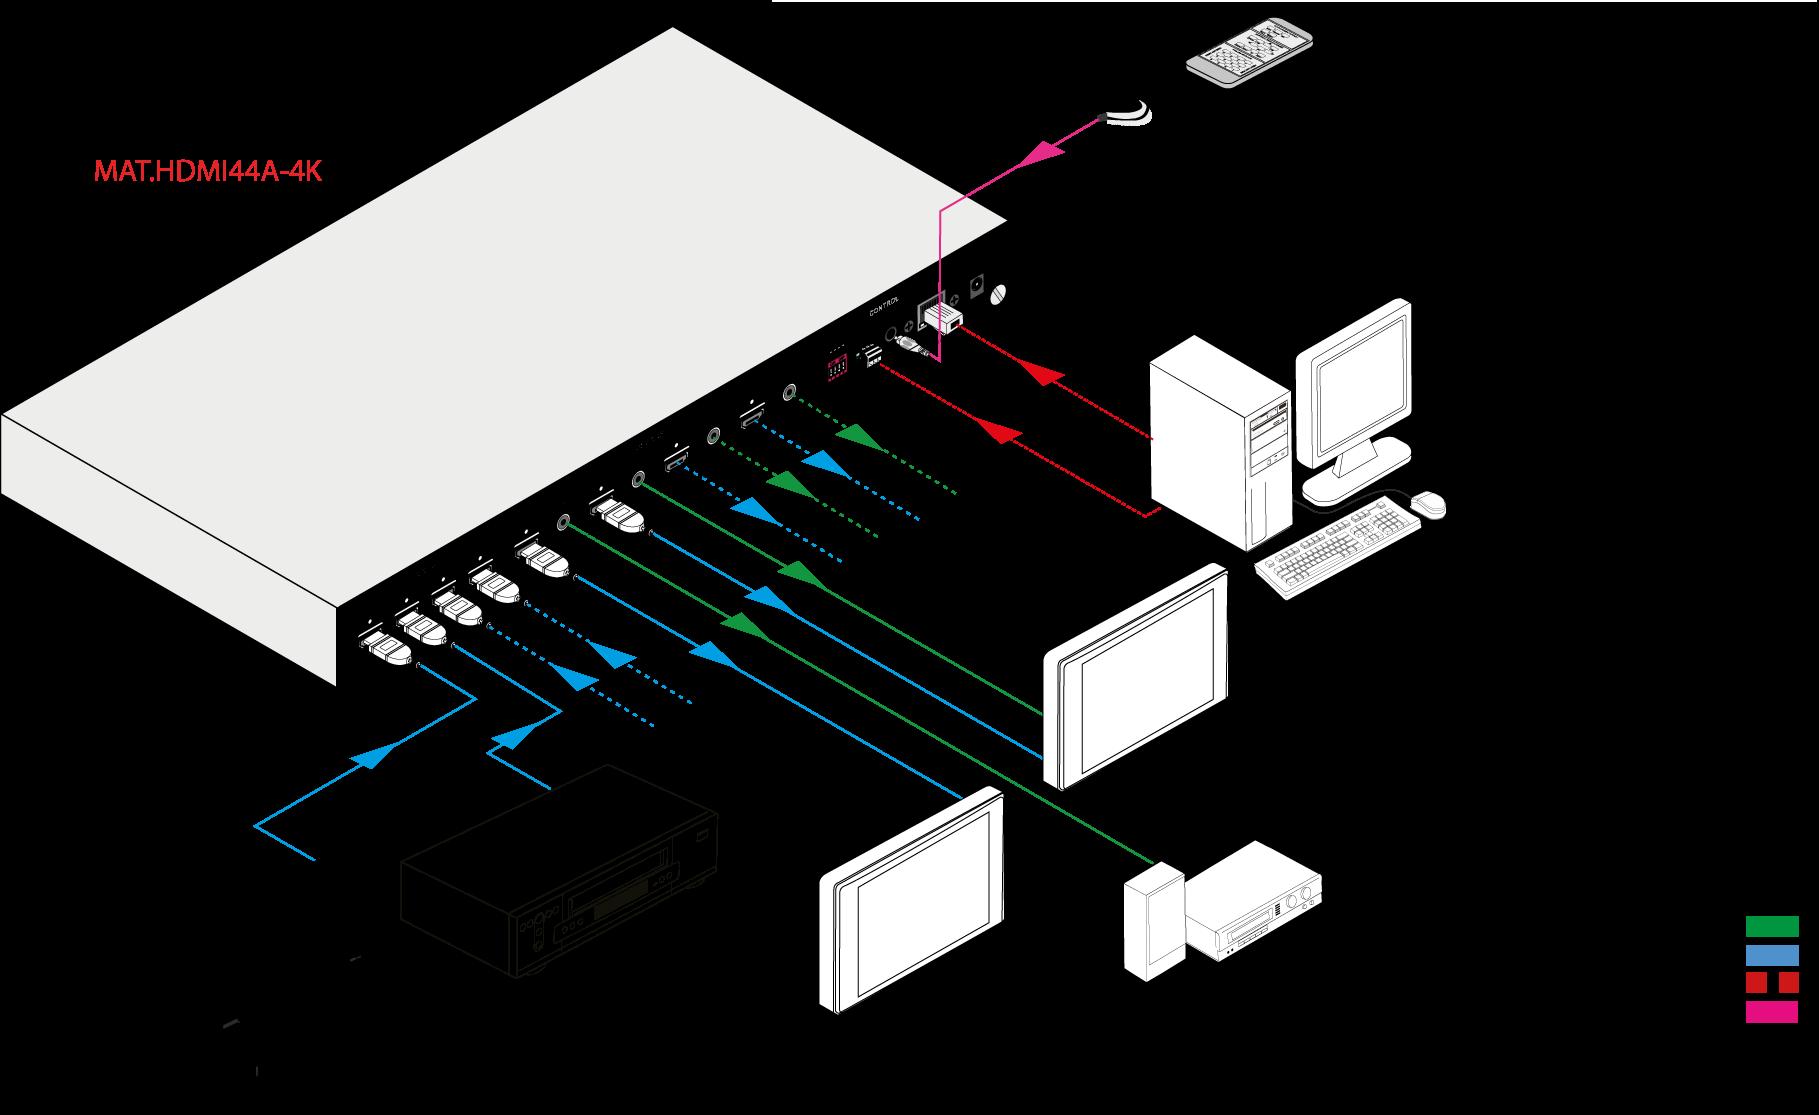 MAT.HDMI44A-4K | Matrice HDMI 4x4 Audio